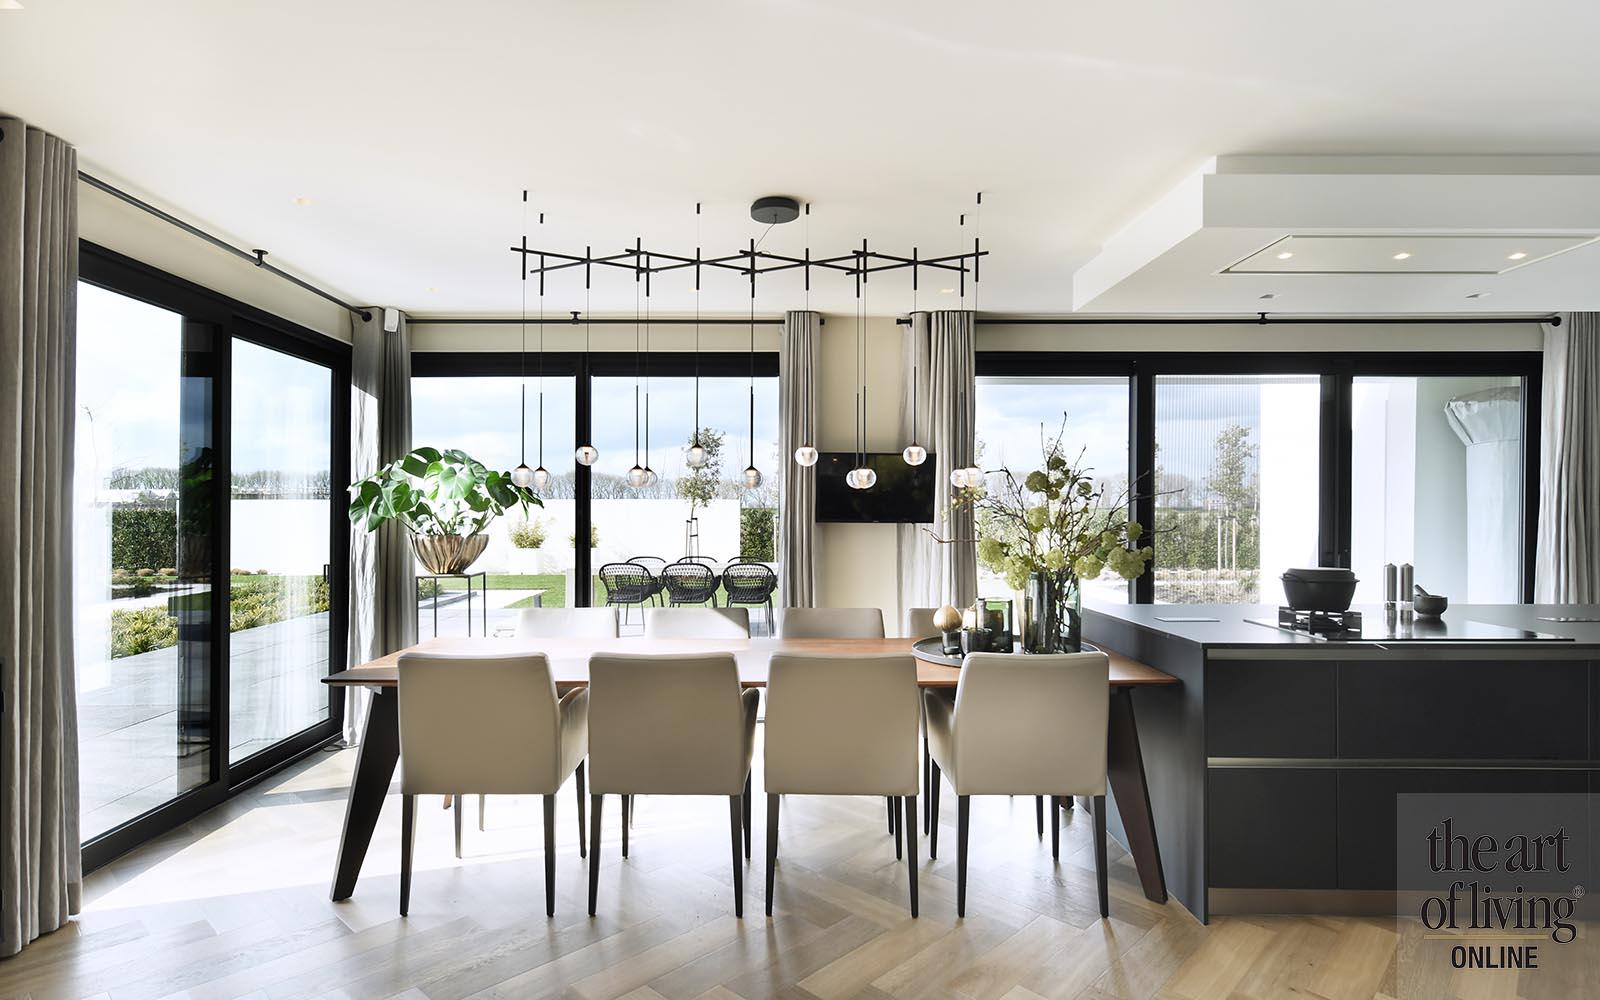 Strakke villa   Sjaak, the art of living